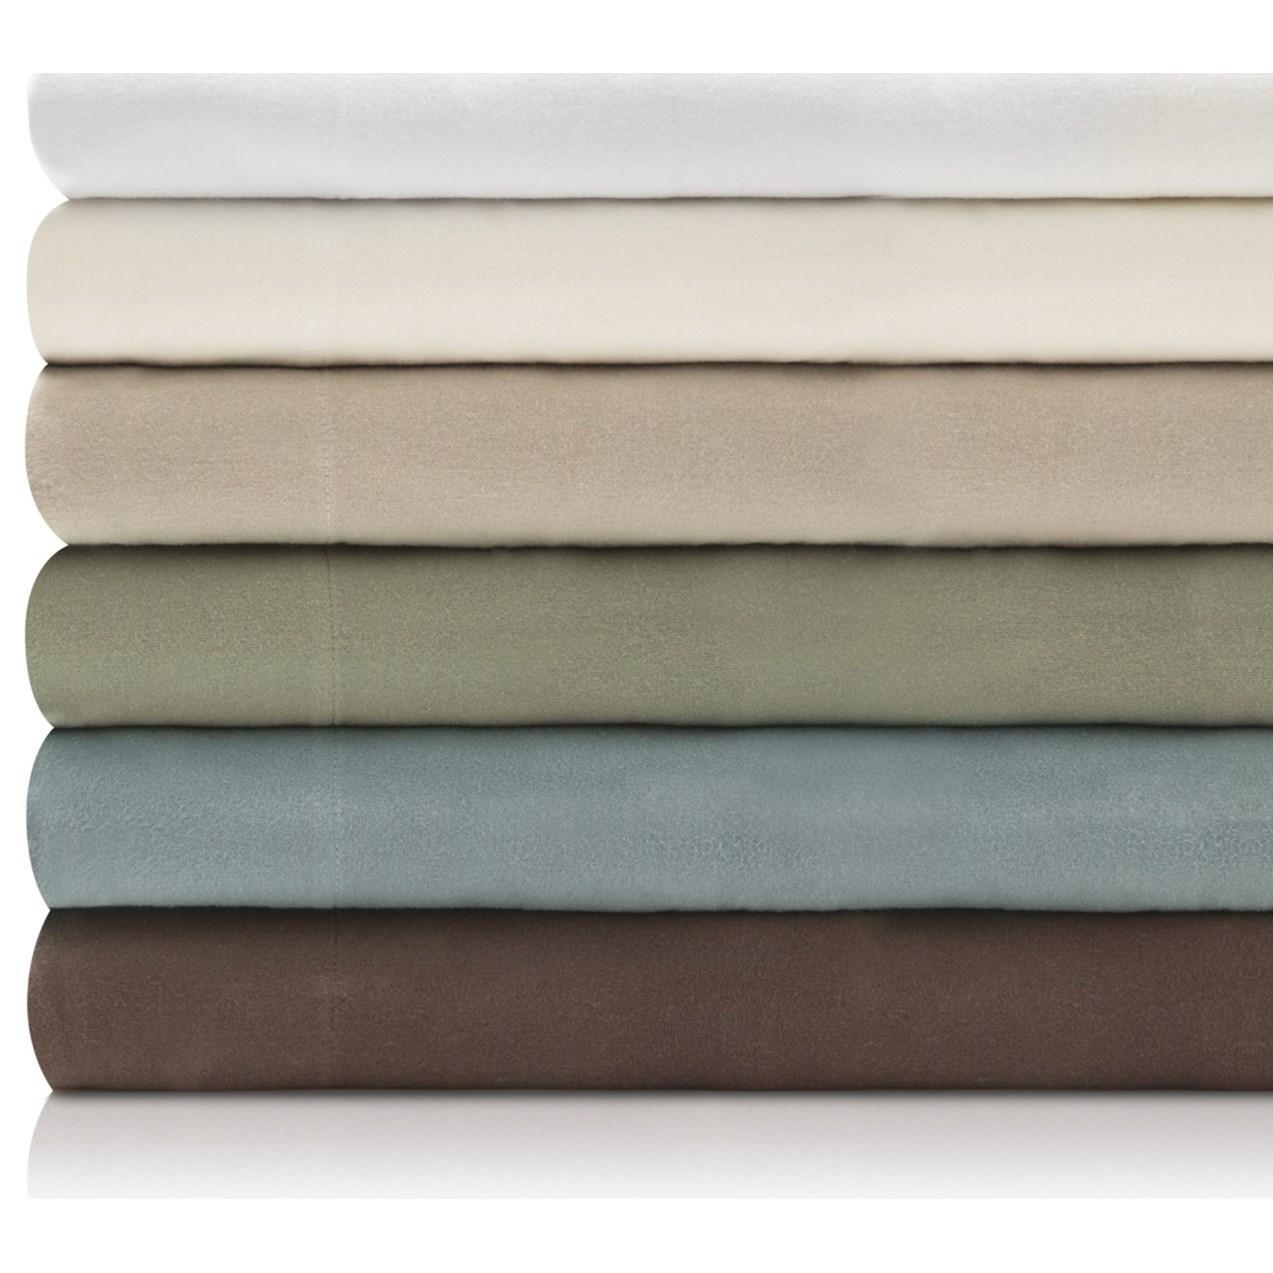 Malouf Portuguese Flannel Split King Woven™ Portuguese Flannel Sheet S - Item Number: WO19SKPAFS